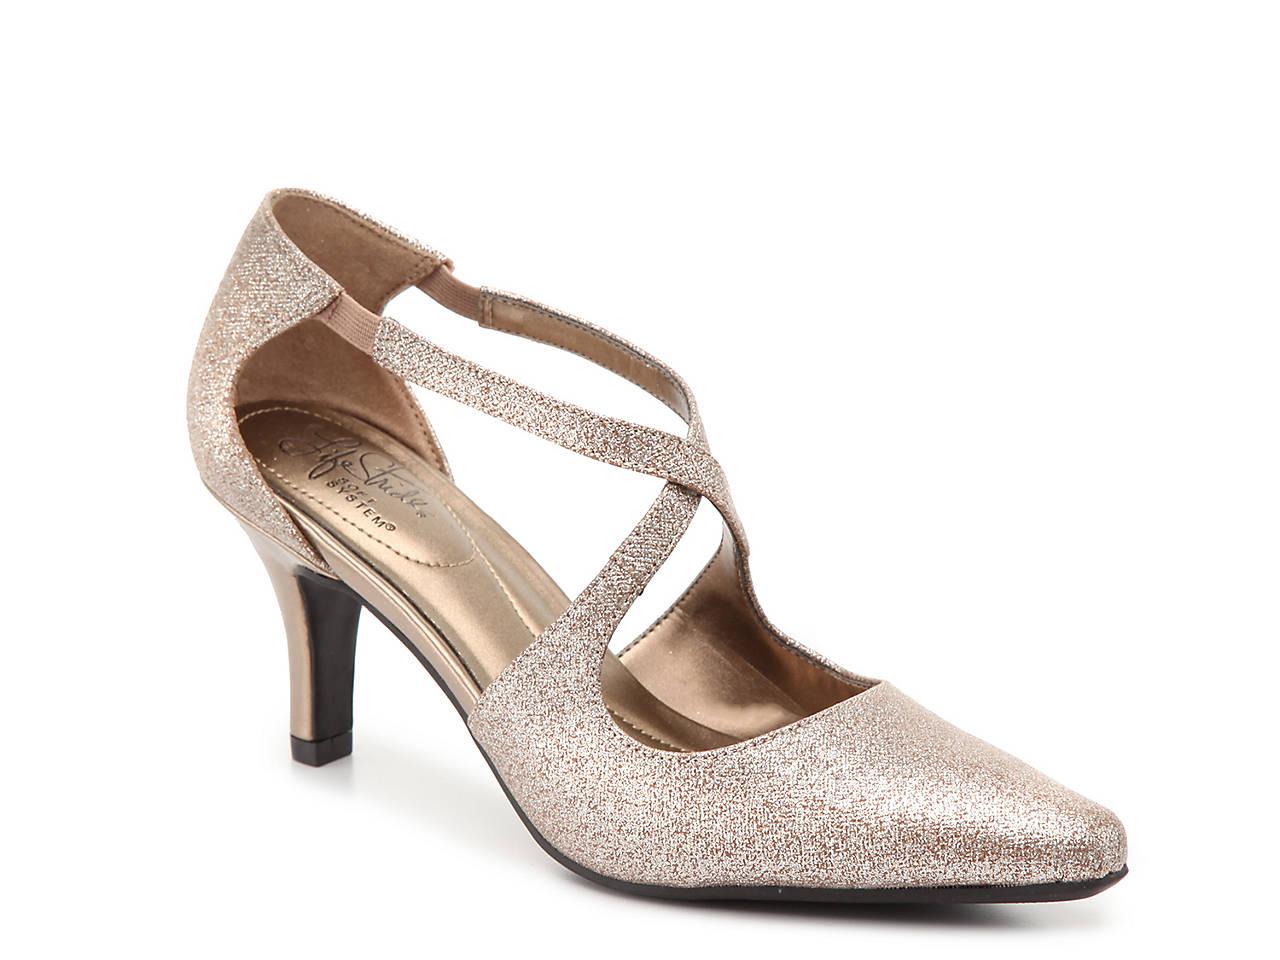 73b7ace5974 LifeStride Kalika Pump Women s Shoes